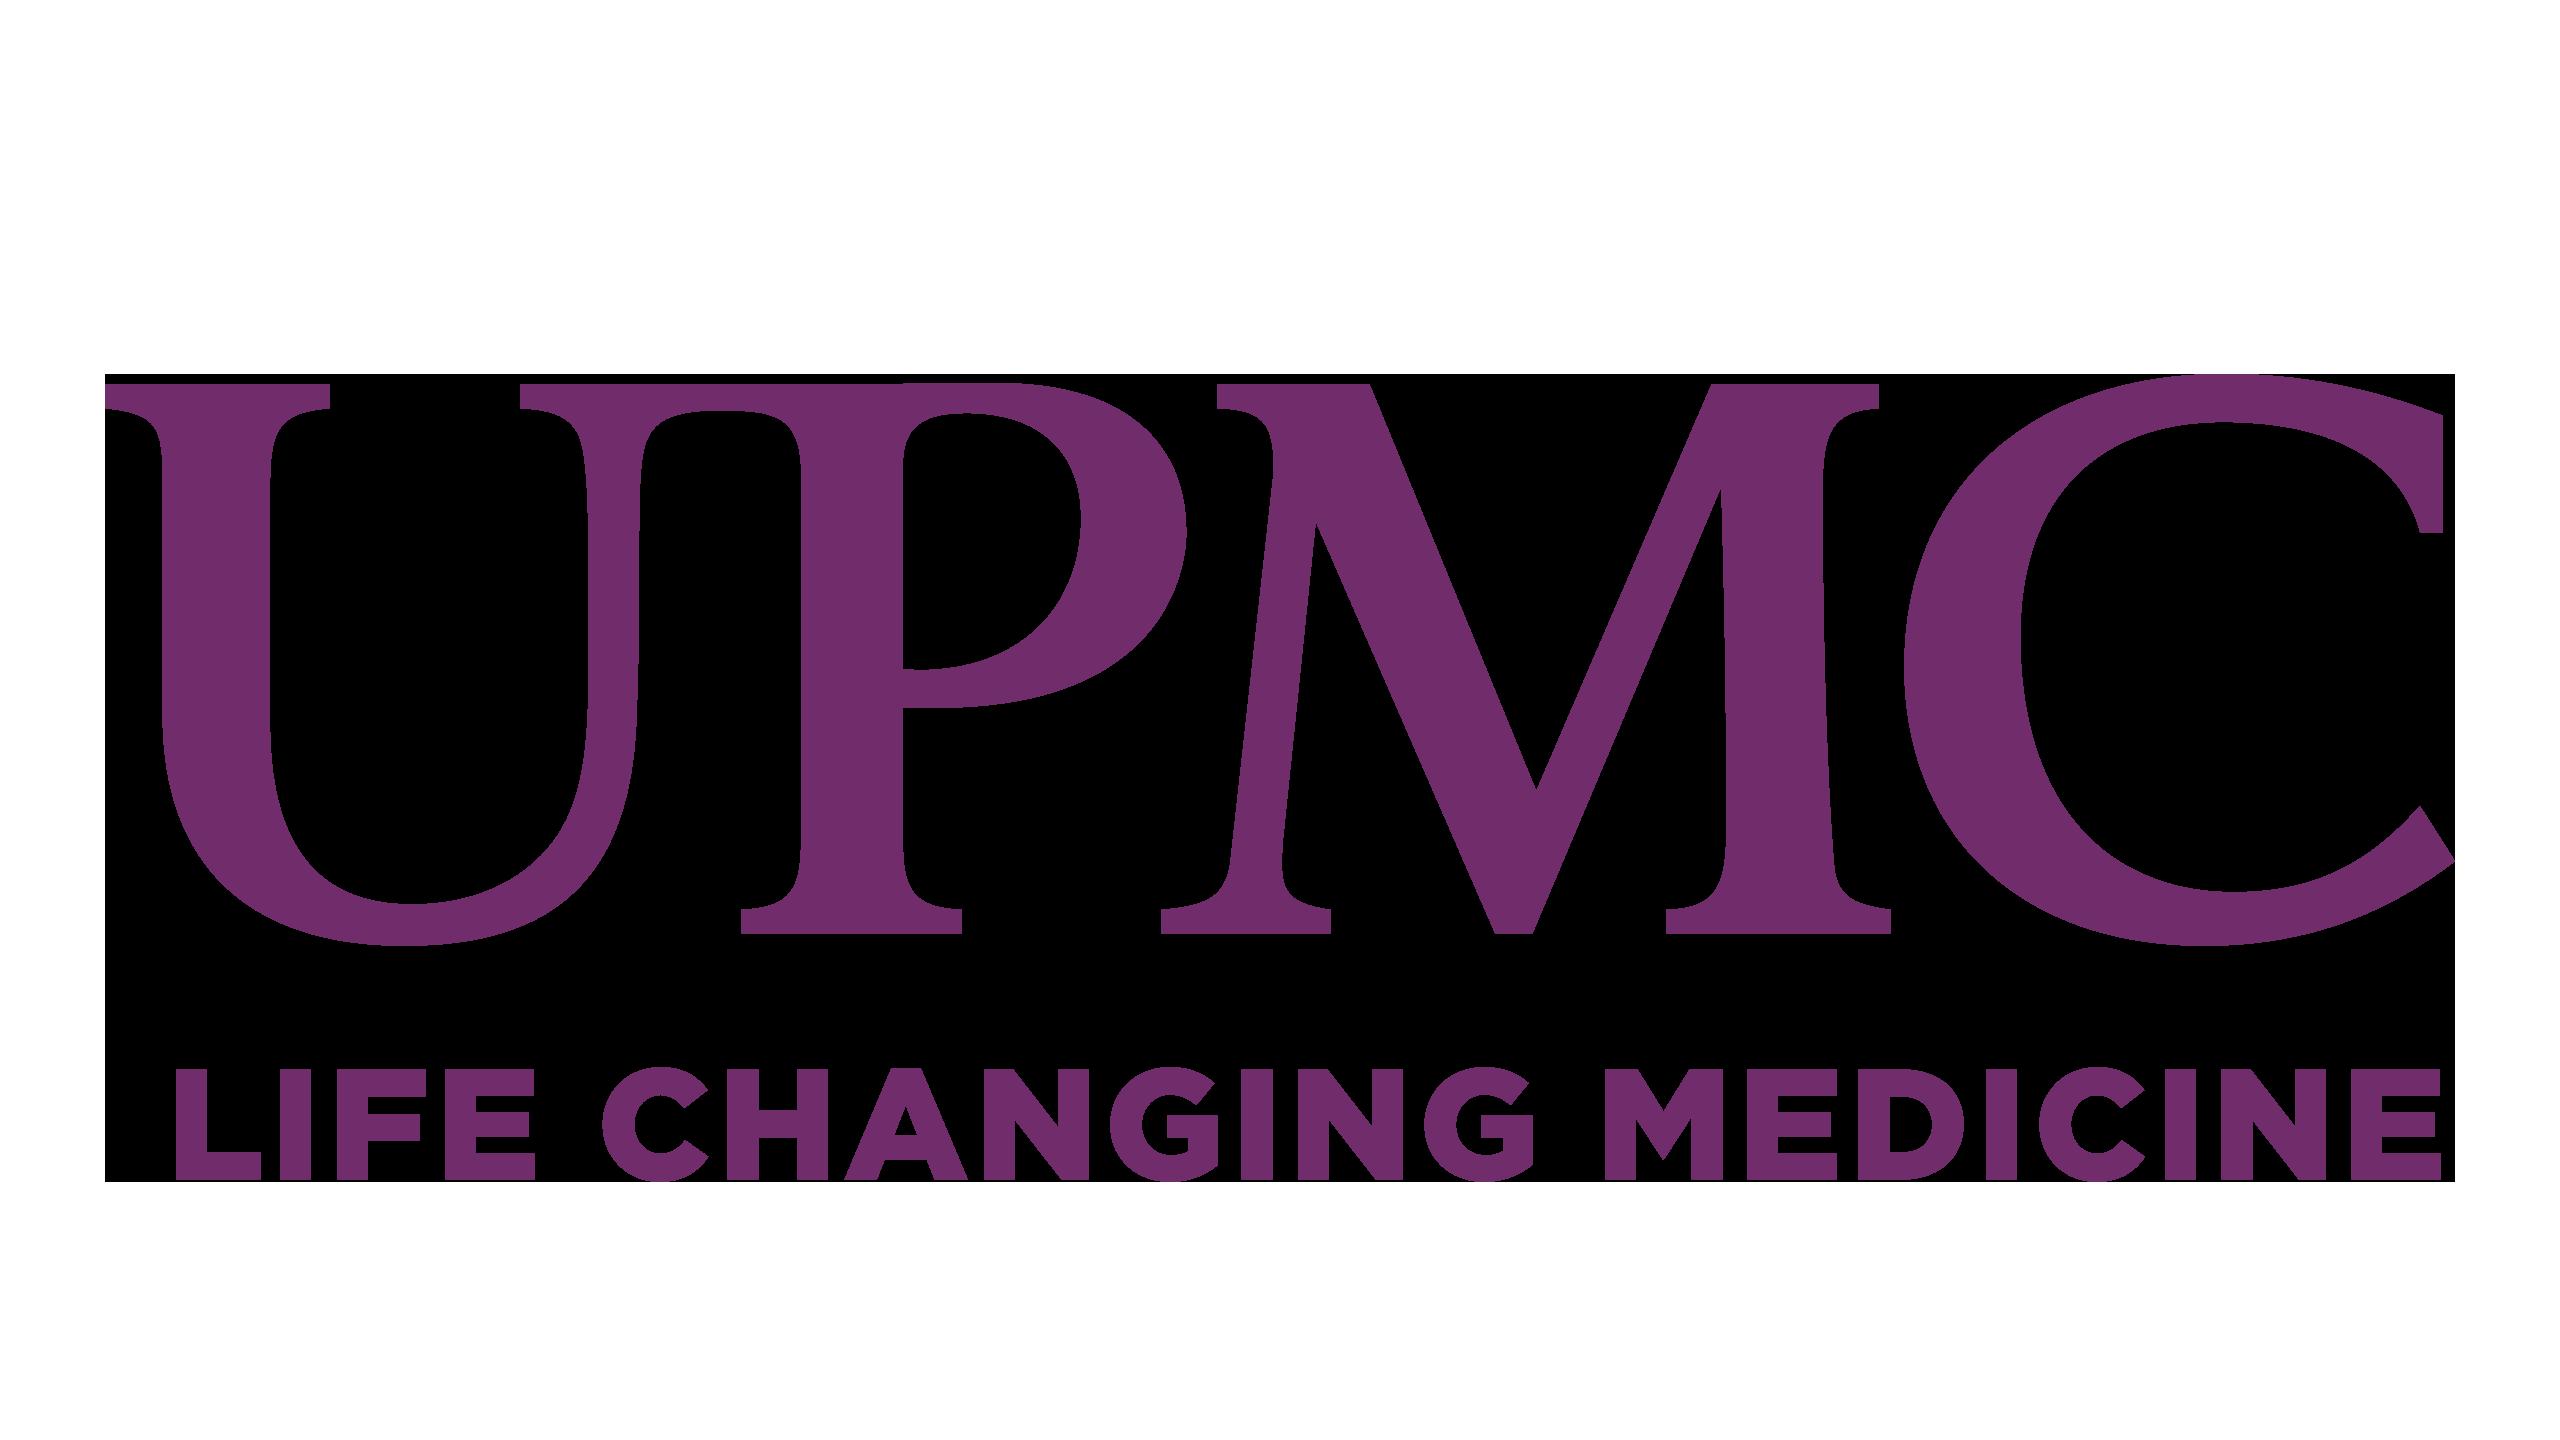 Logo_UPMC_Life_Changing_Medicine_2020